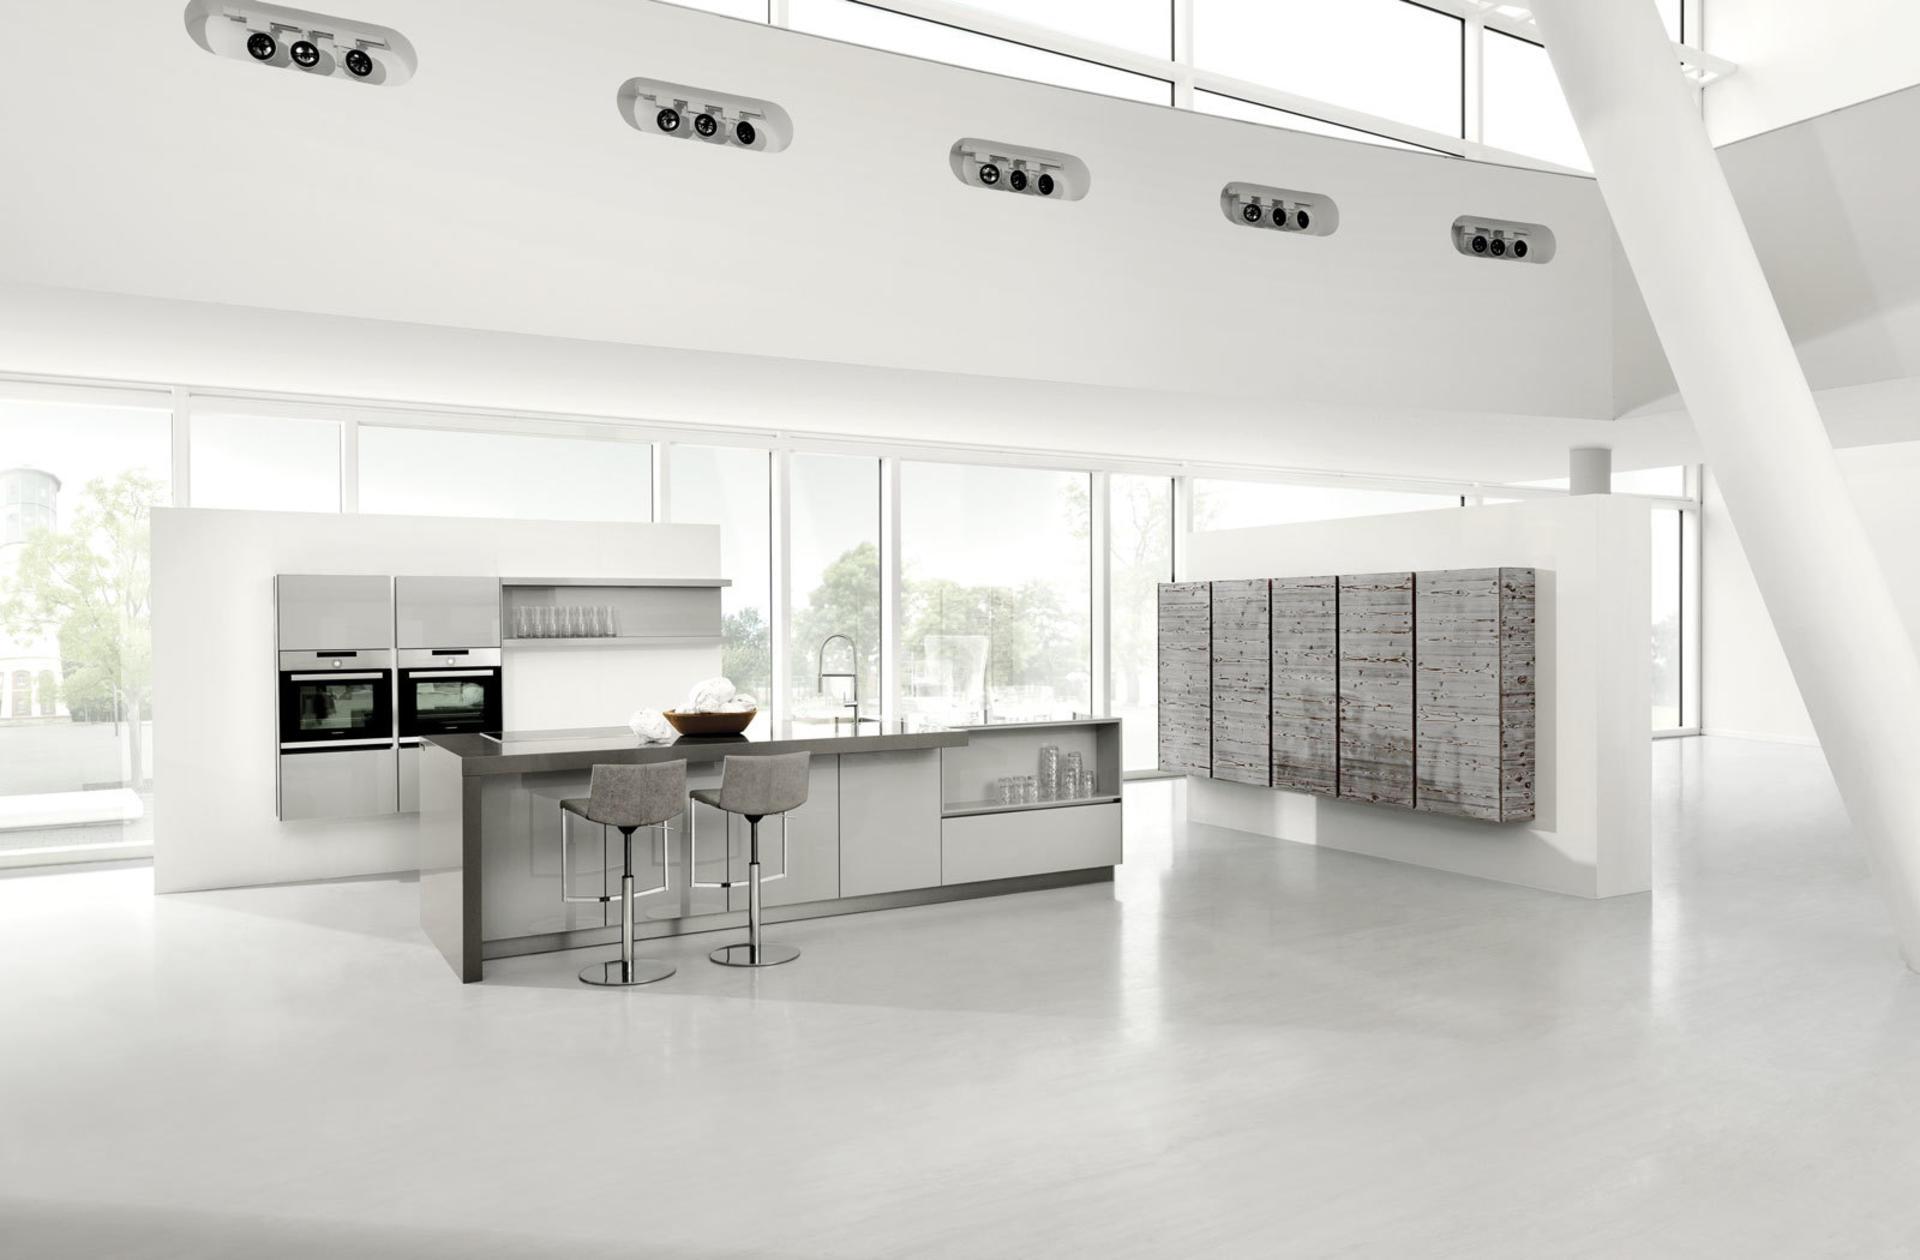 Кухни Häcker, Dark pine veneered / Light grey high gloss lacquer 5083 GL | 4030 GL